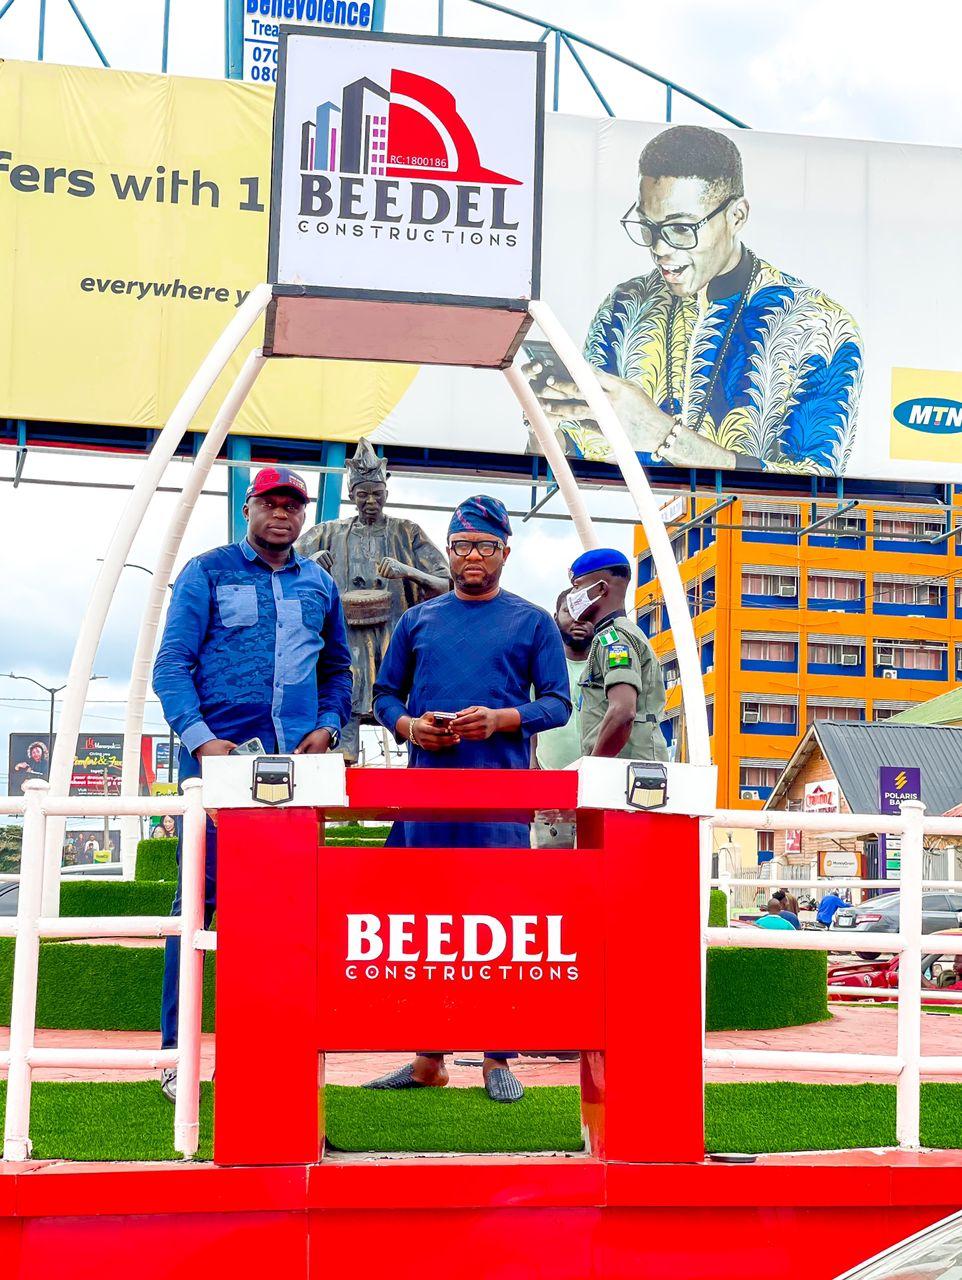 BEEDEL Constructions Reconstruct, Beautify Popular Roundabout In Ibadan